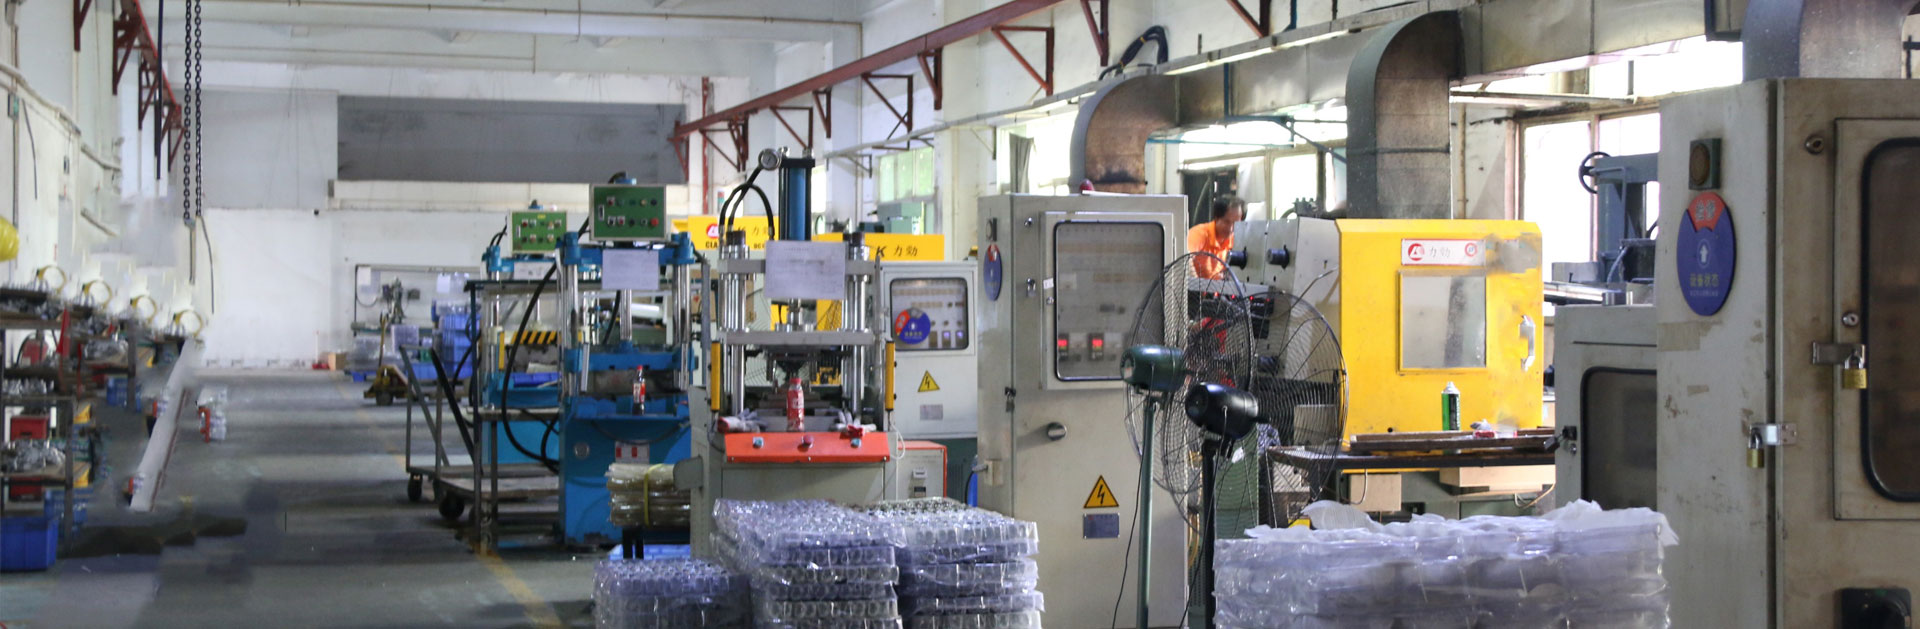 Ingeniería de fundición a presión: proceso de fundición a presión